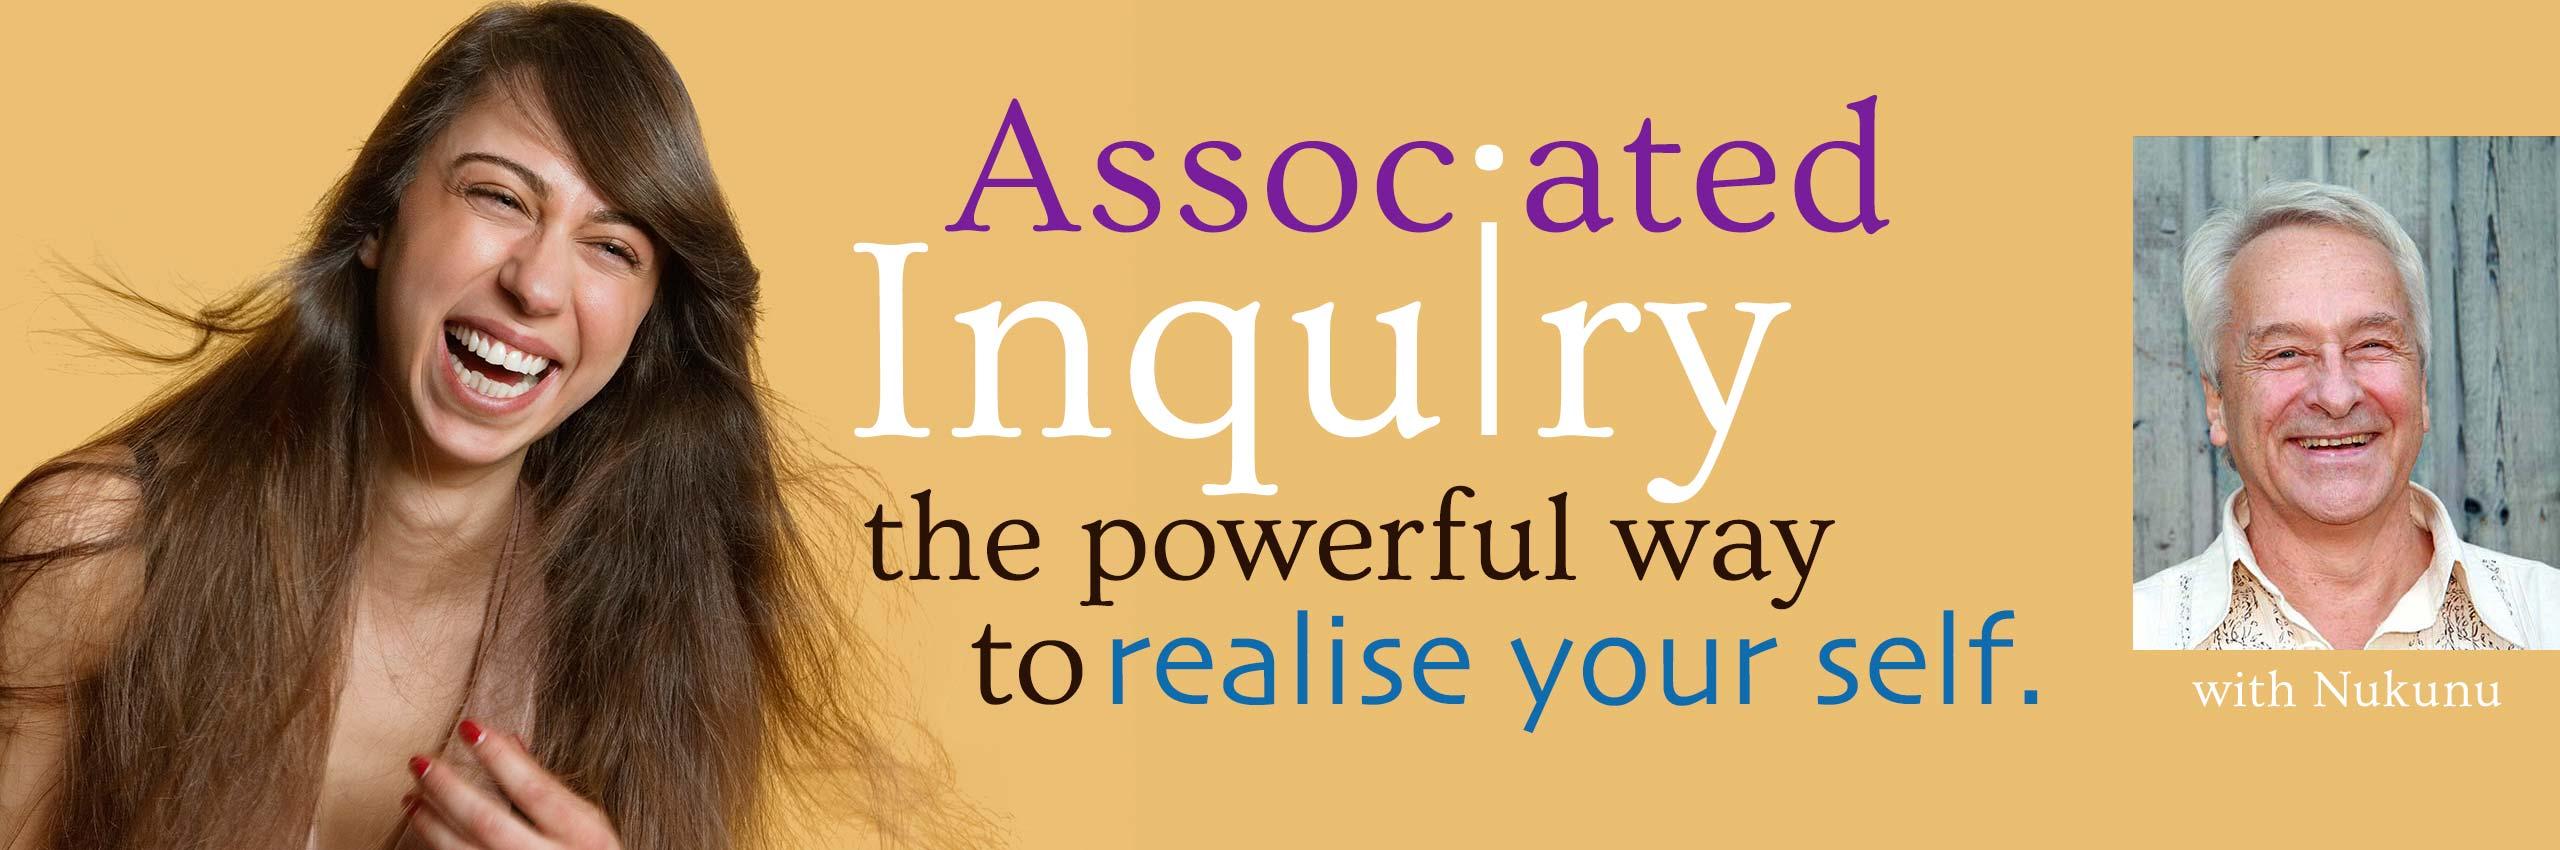 associated-inquiry with Nukunu